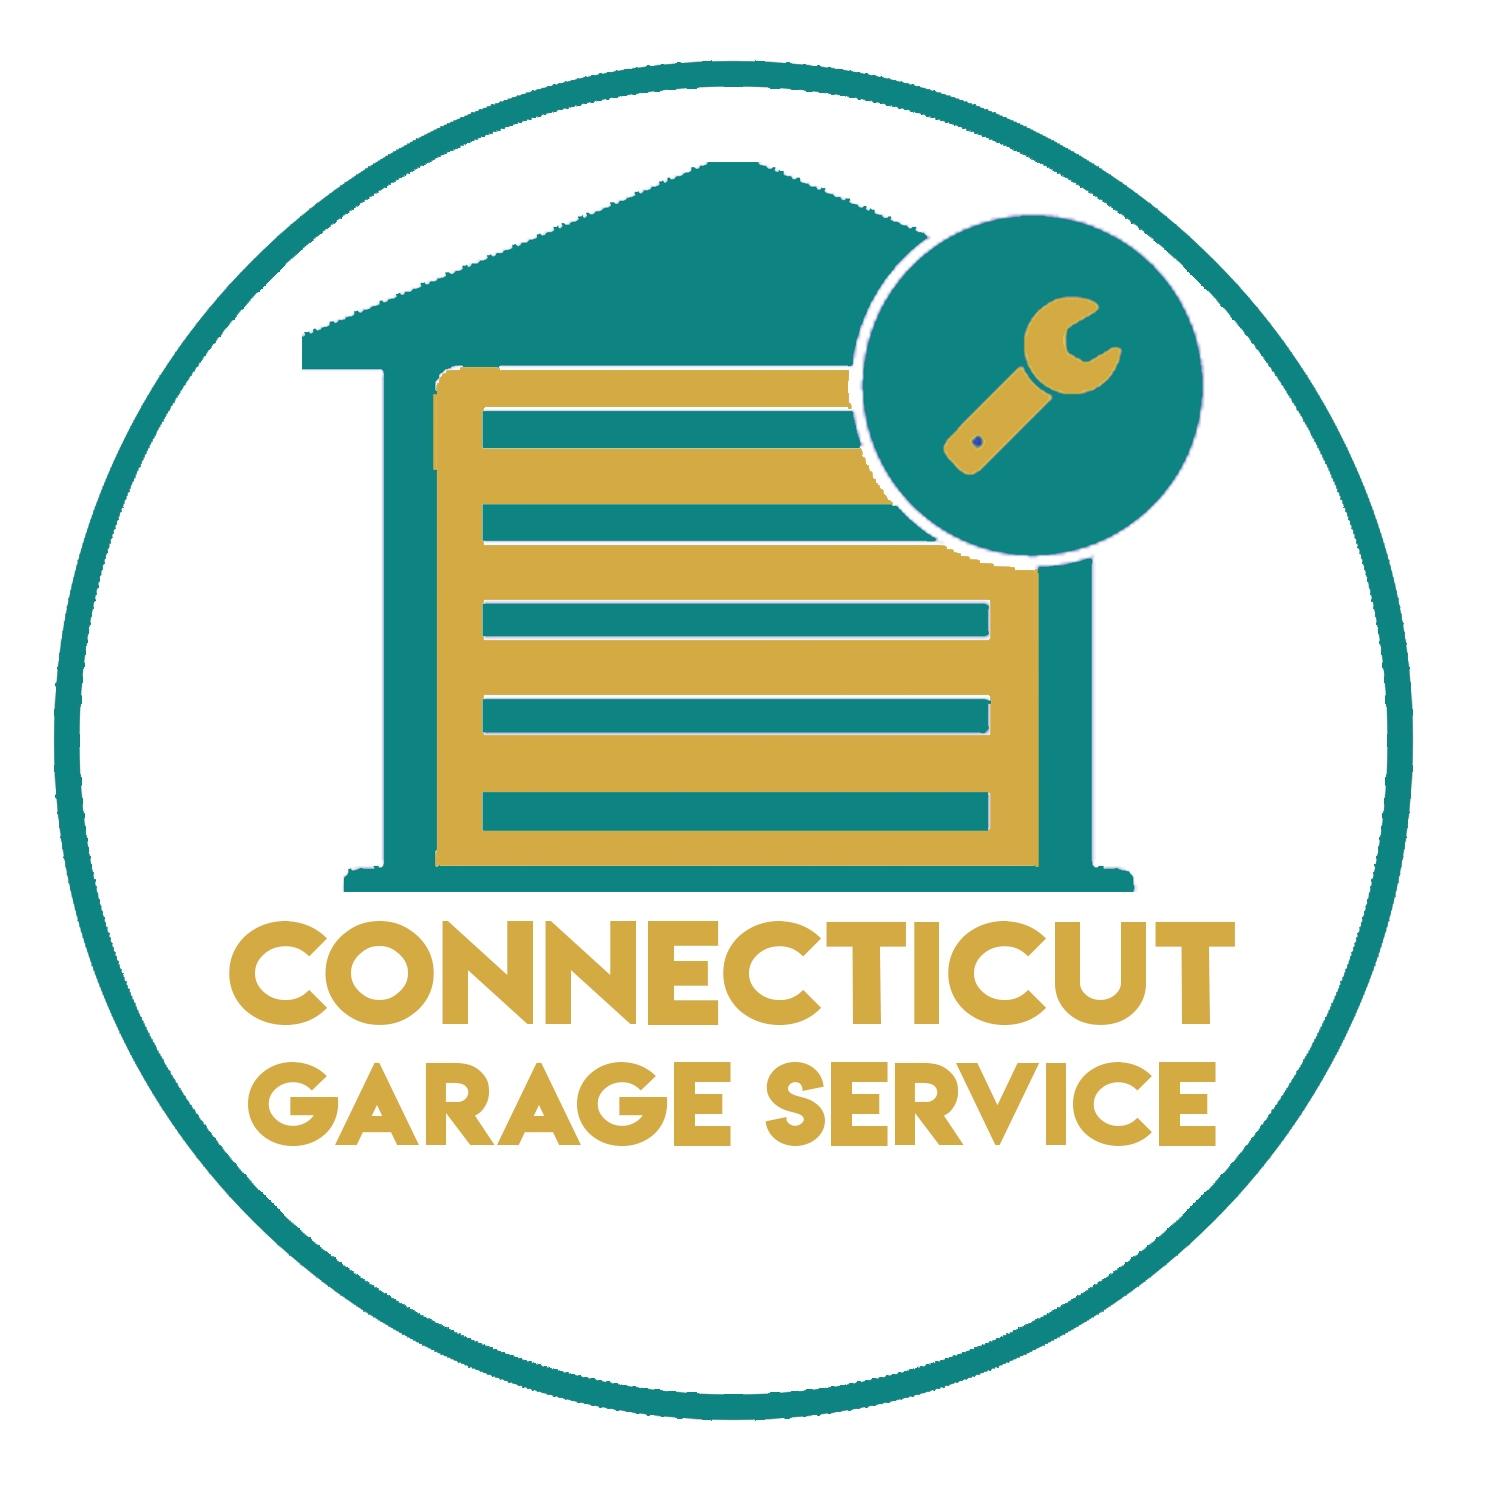 Connecticut Garage Service LLC logo